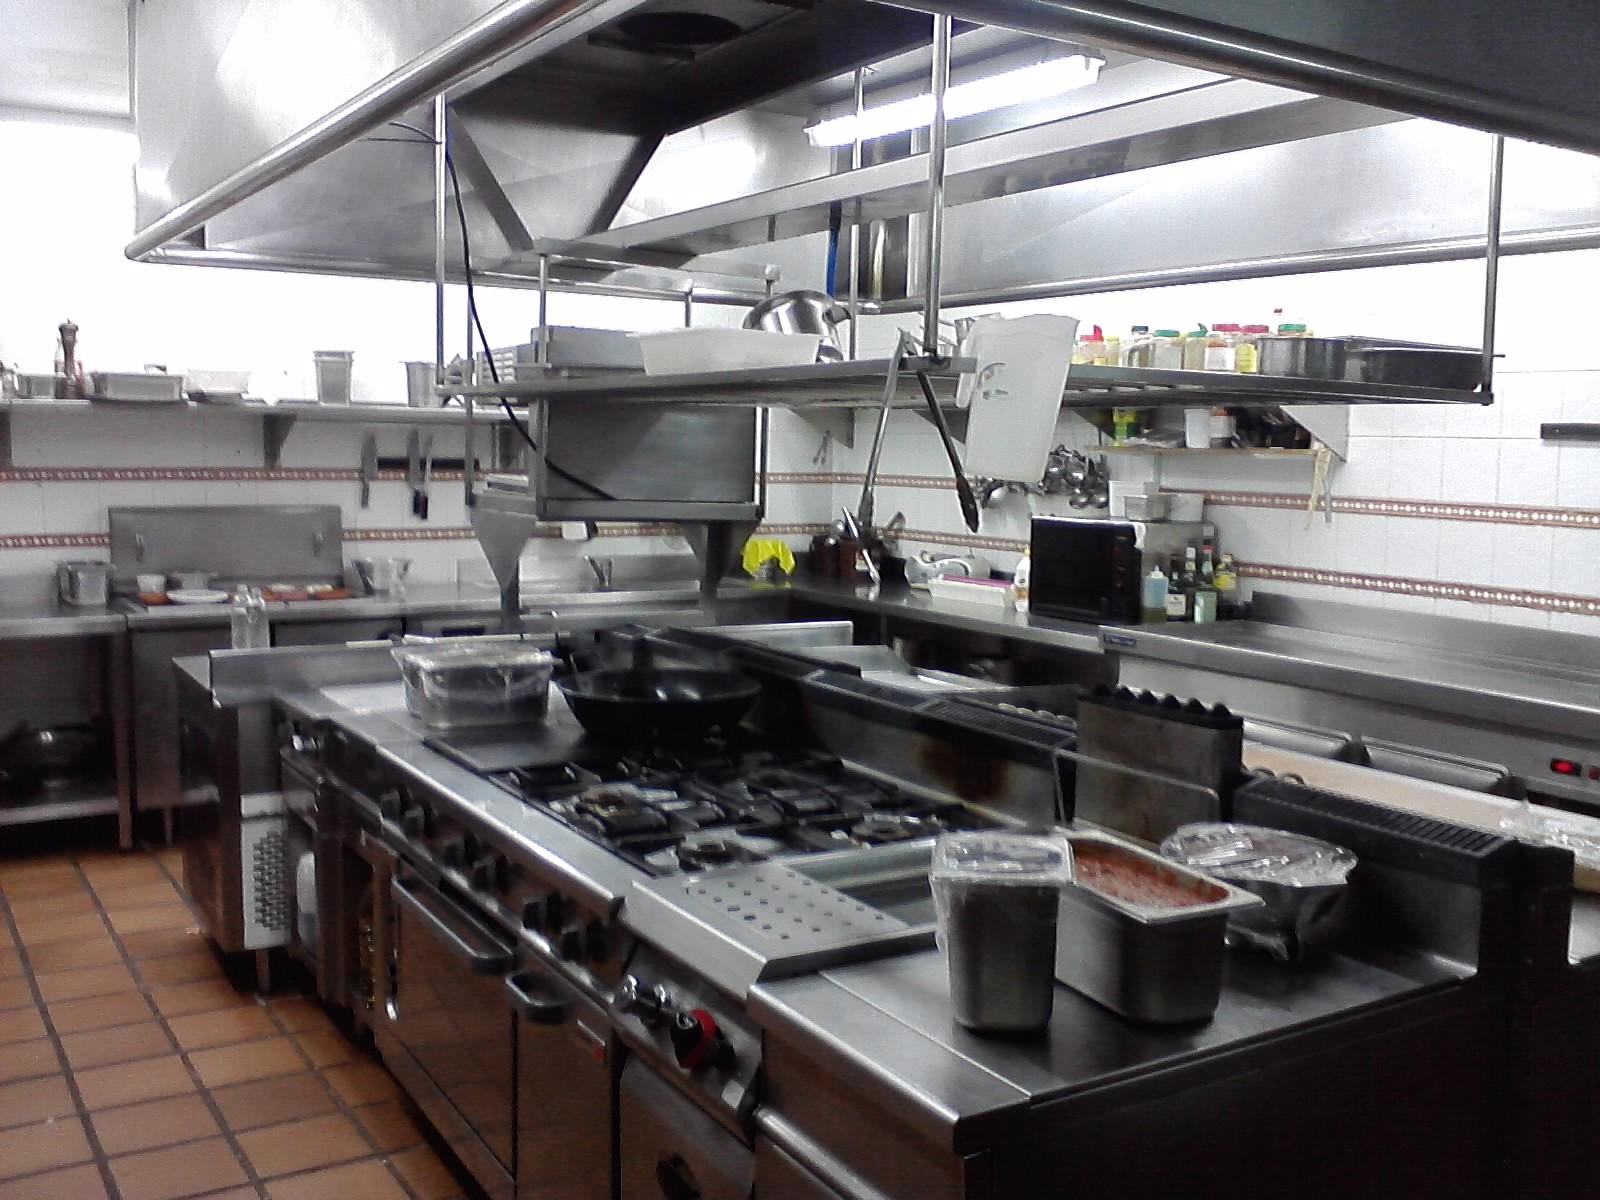 Tallerdehosteler ab sica junio 2012 for Cocina de restaurante